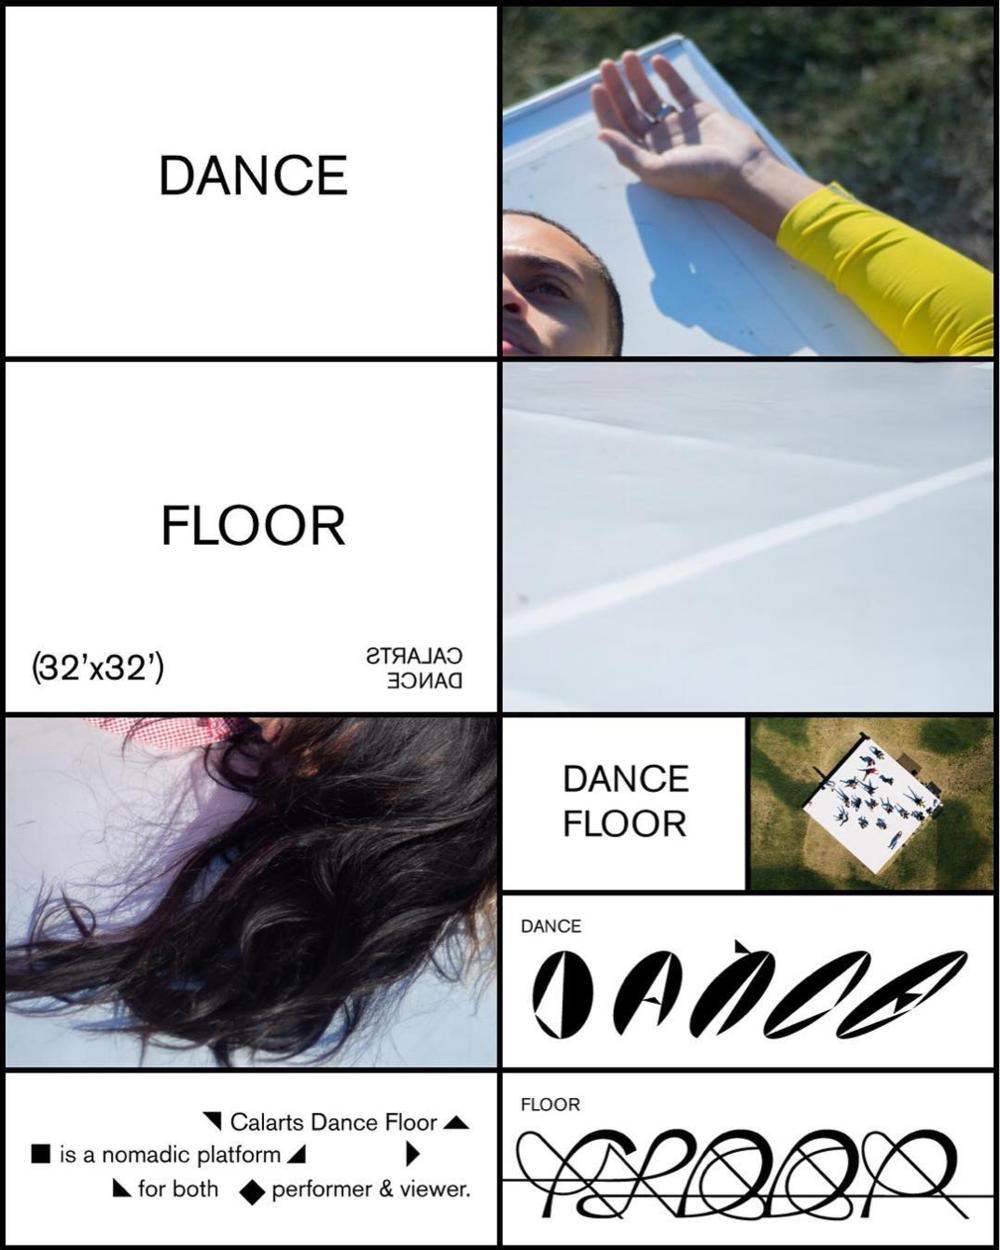 calarts_the_floor_13.png